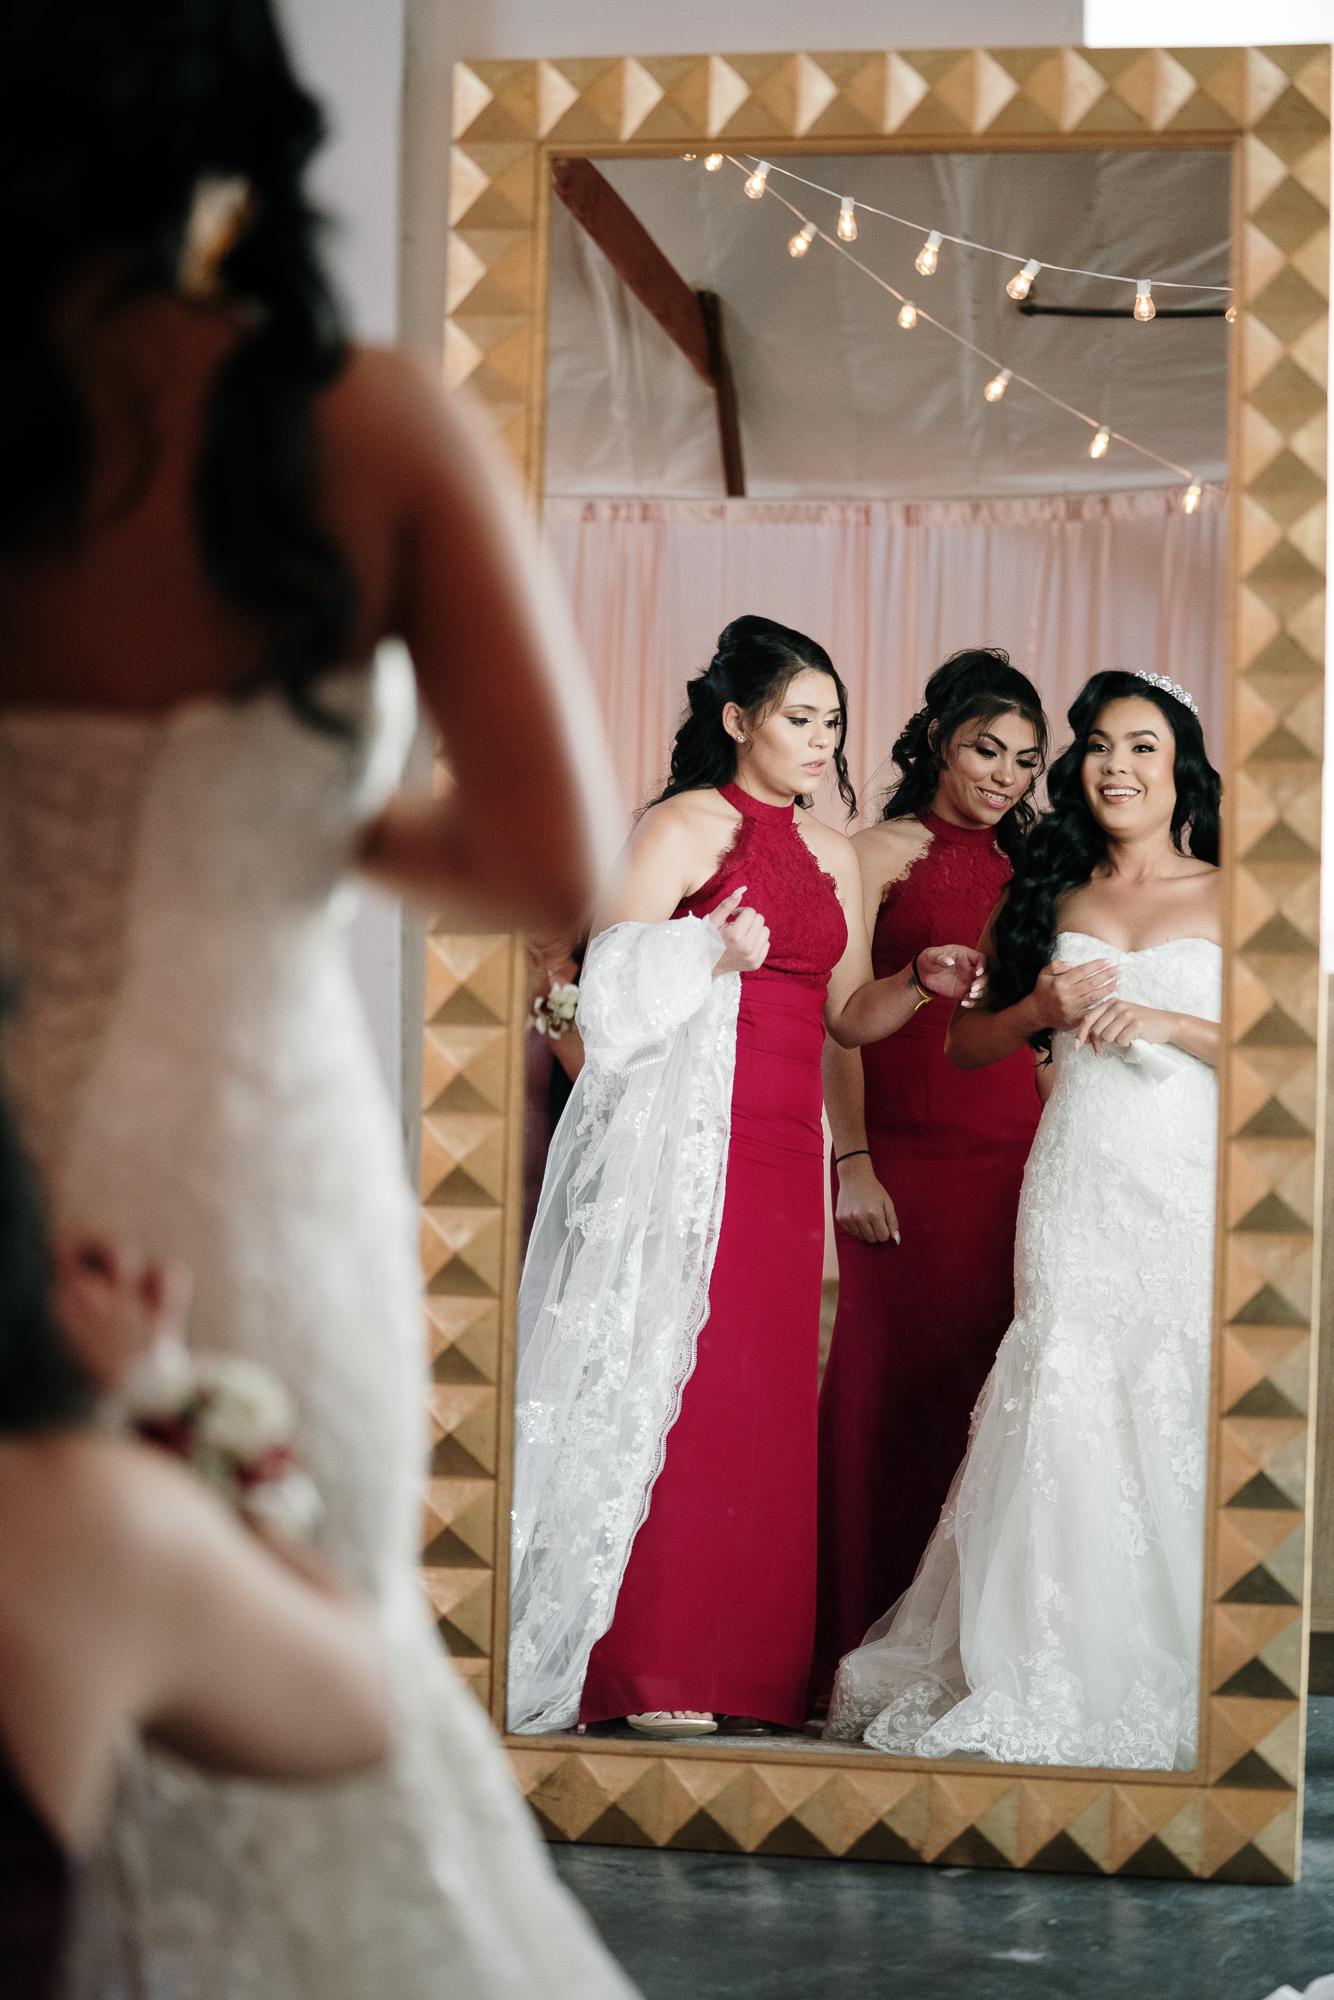 Wedding Day Gown